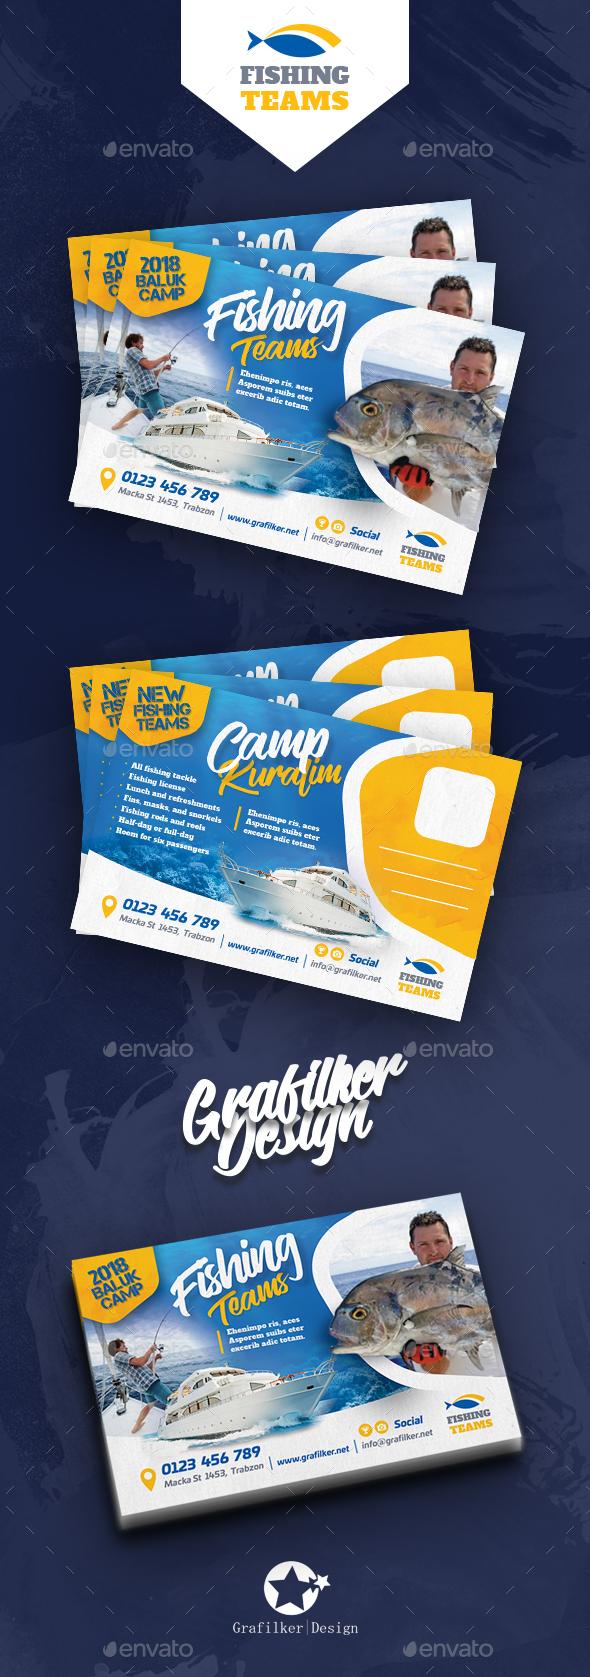 Fishing Tour Postcard Templates - Cards & Invites Print Templates